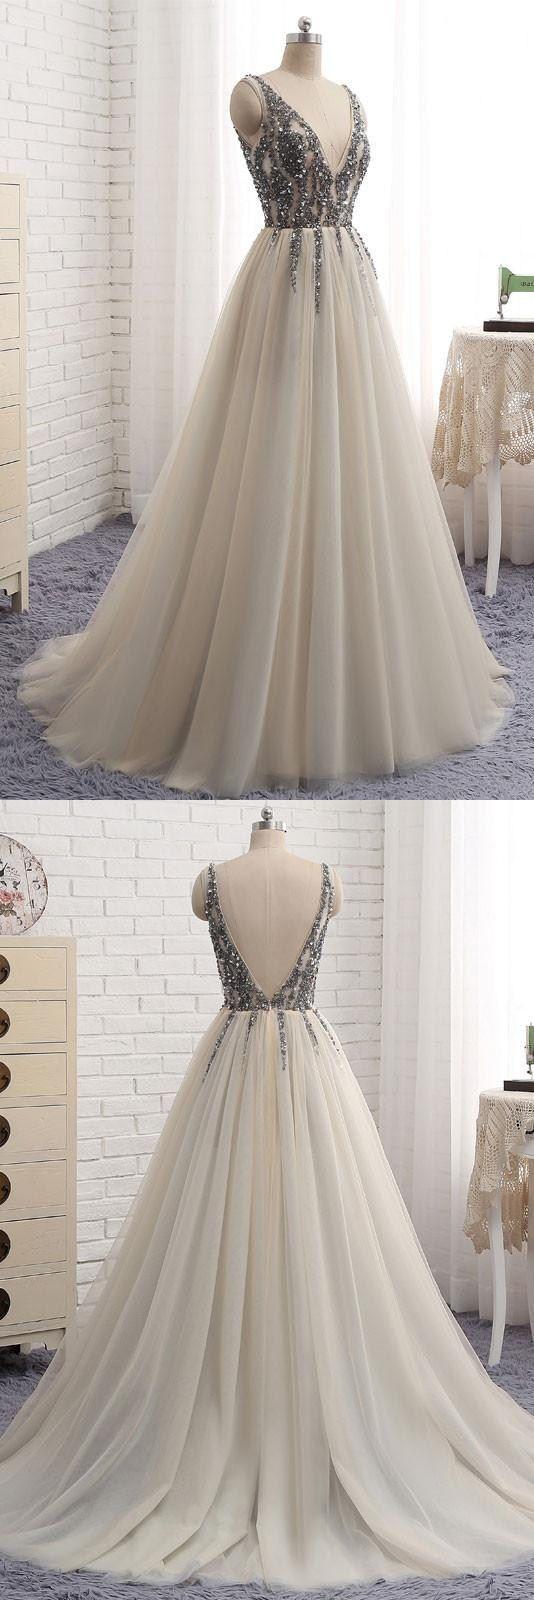 Plus size bling wedding dresses  deep Vneck prom dress longprom dress prom dress longAline prom